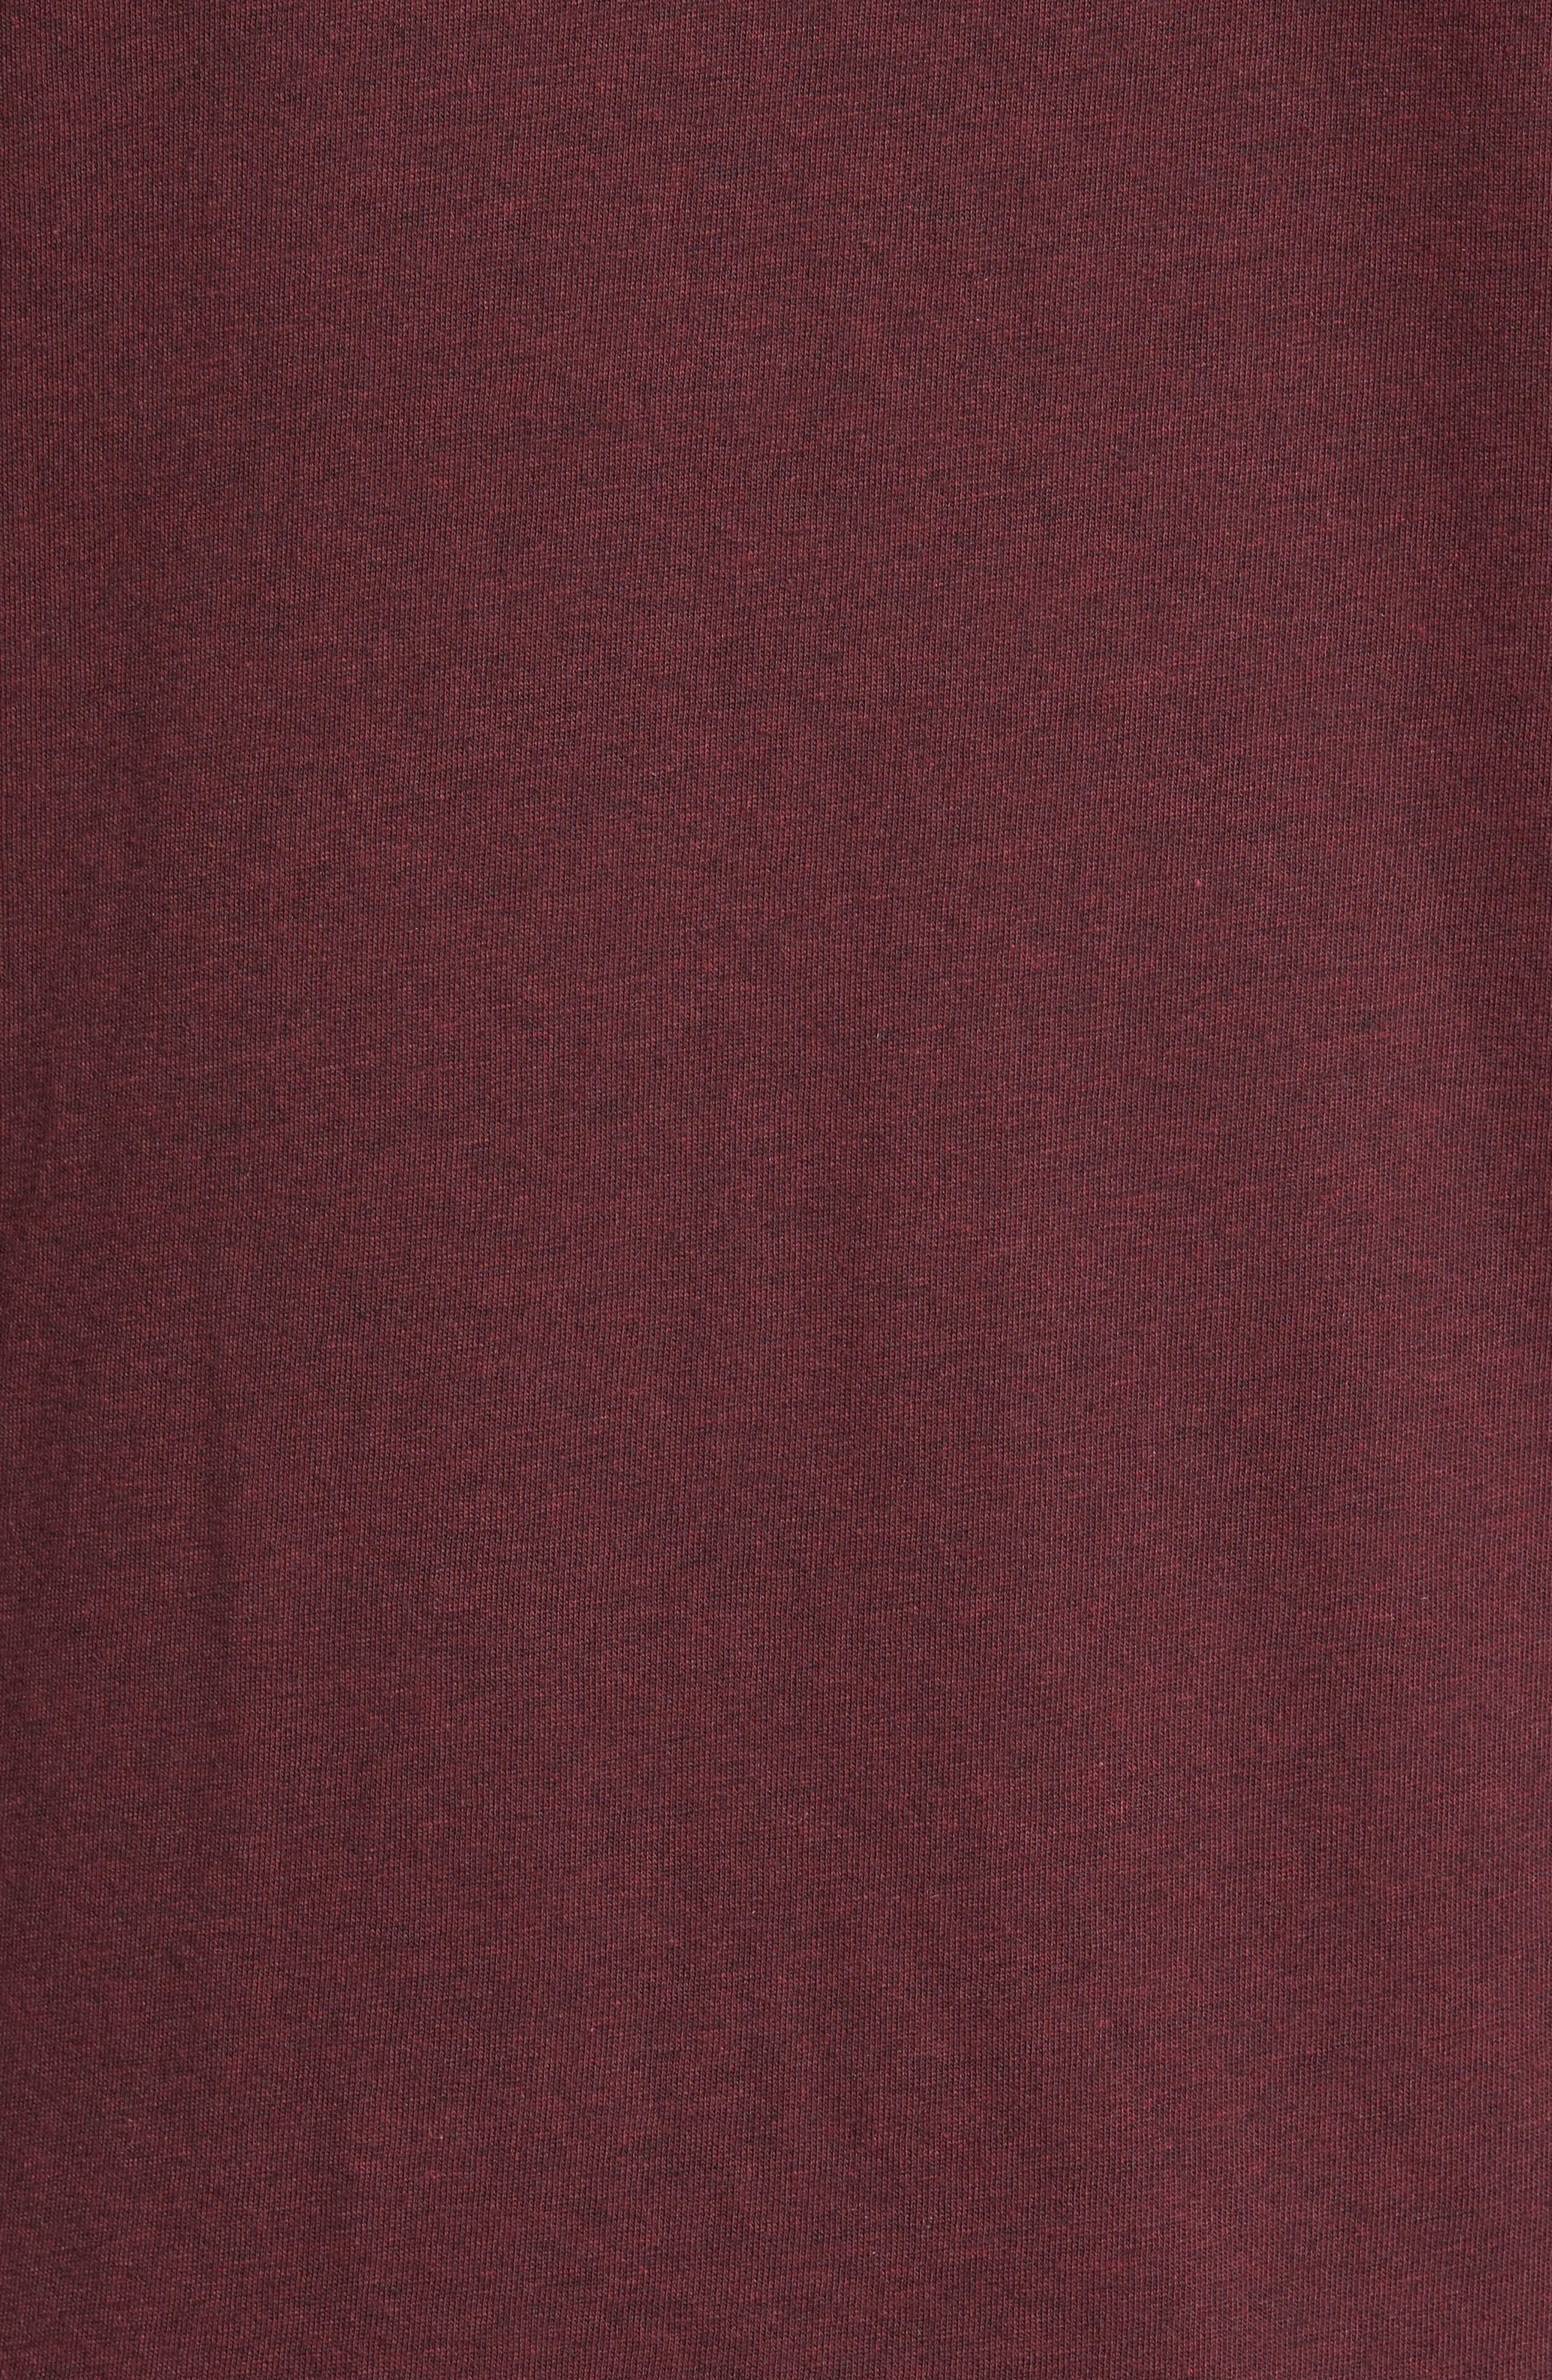 Reversible Hooded Jersey T-Shirt,                             Alternate thumbnail 21, color,